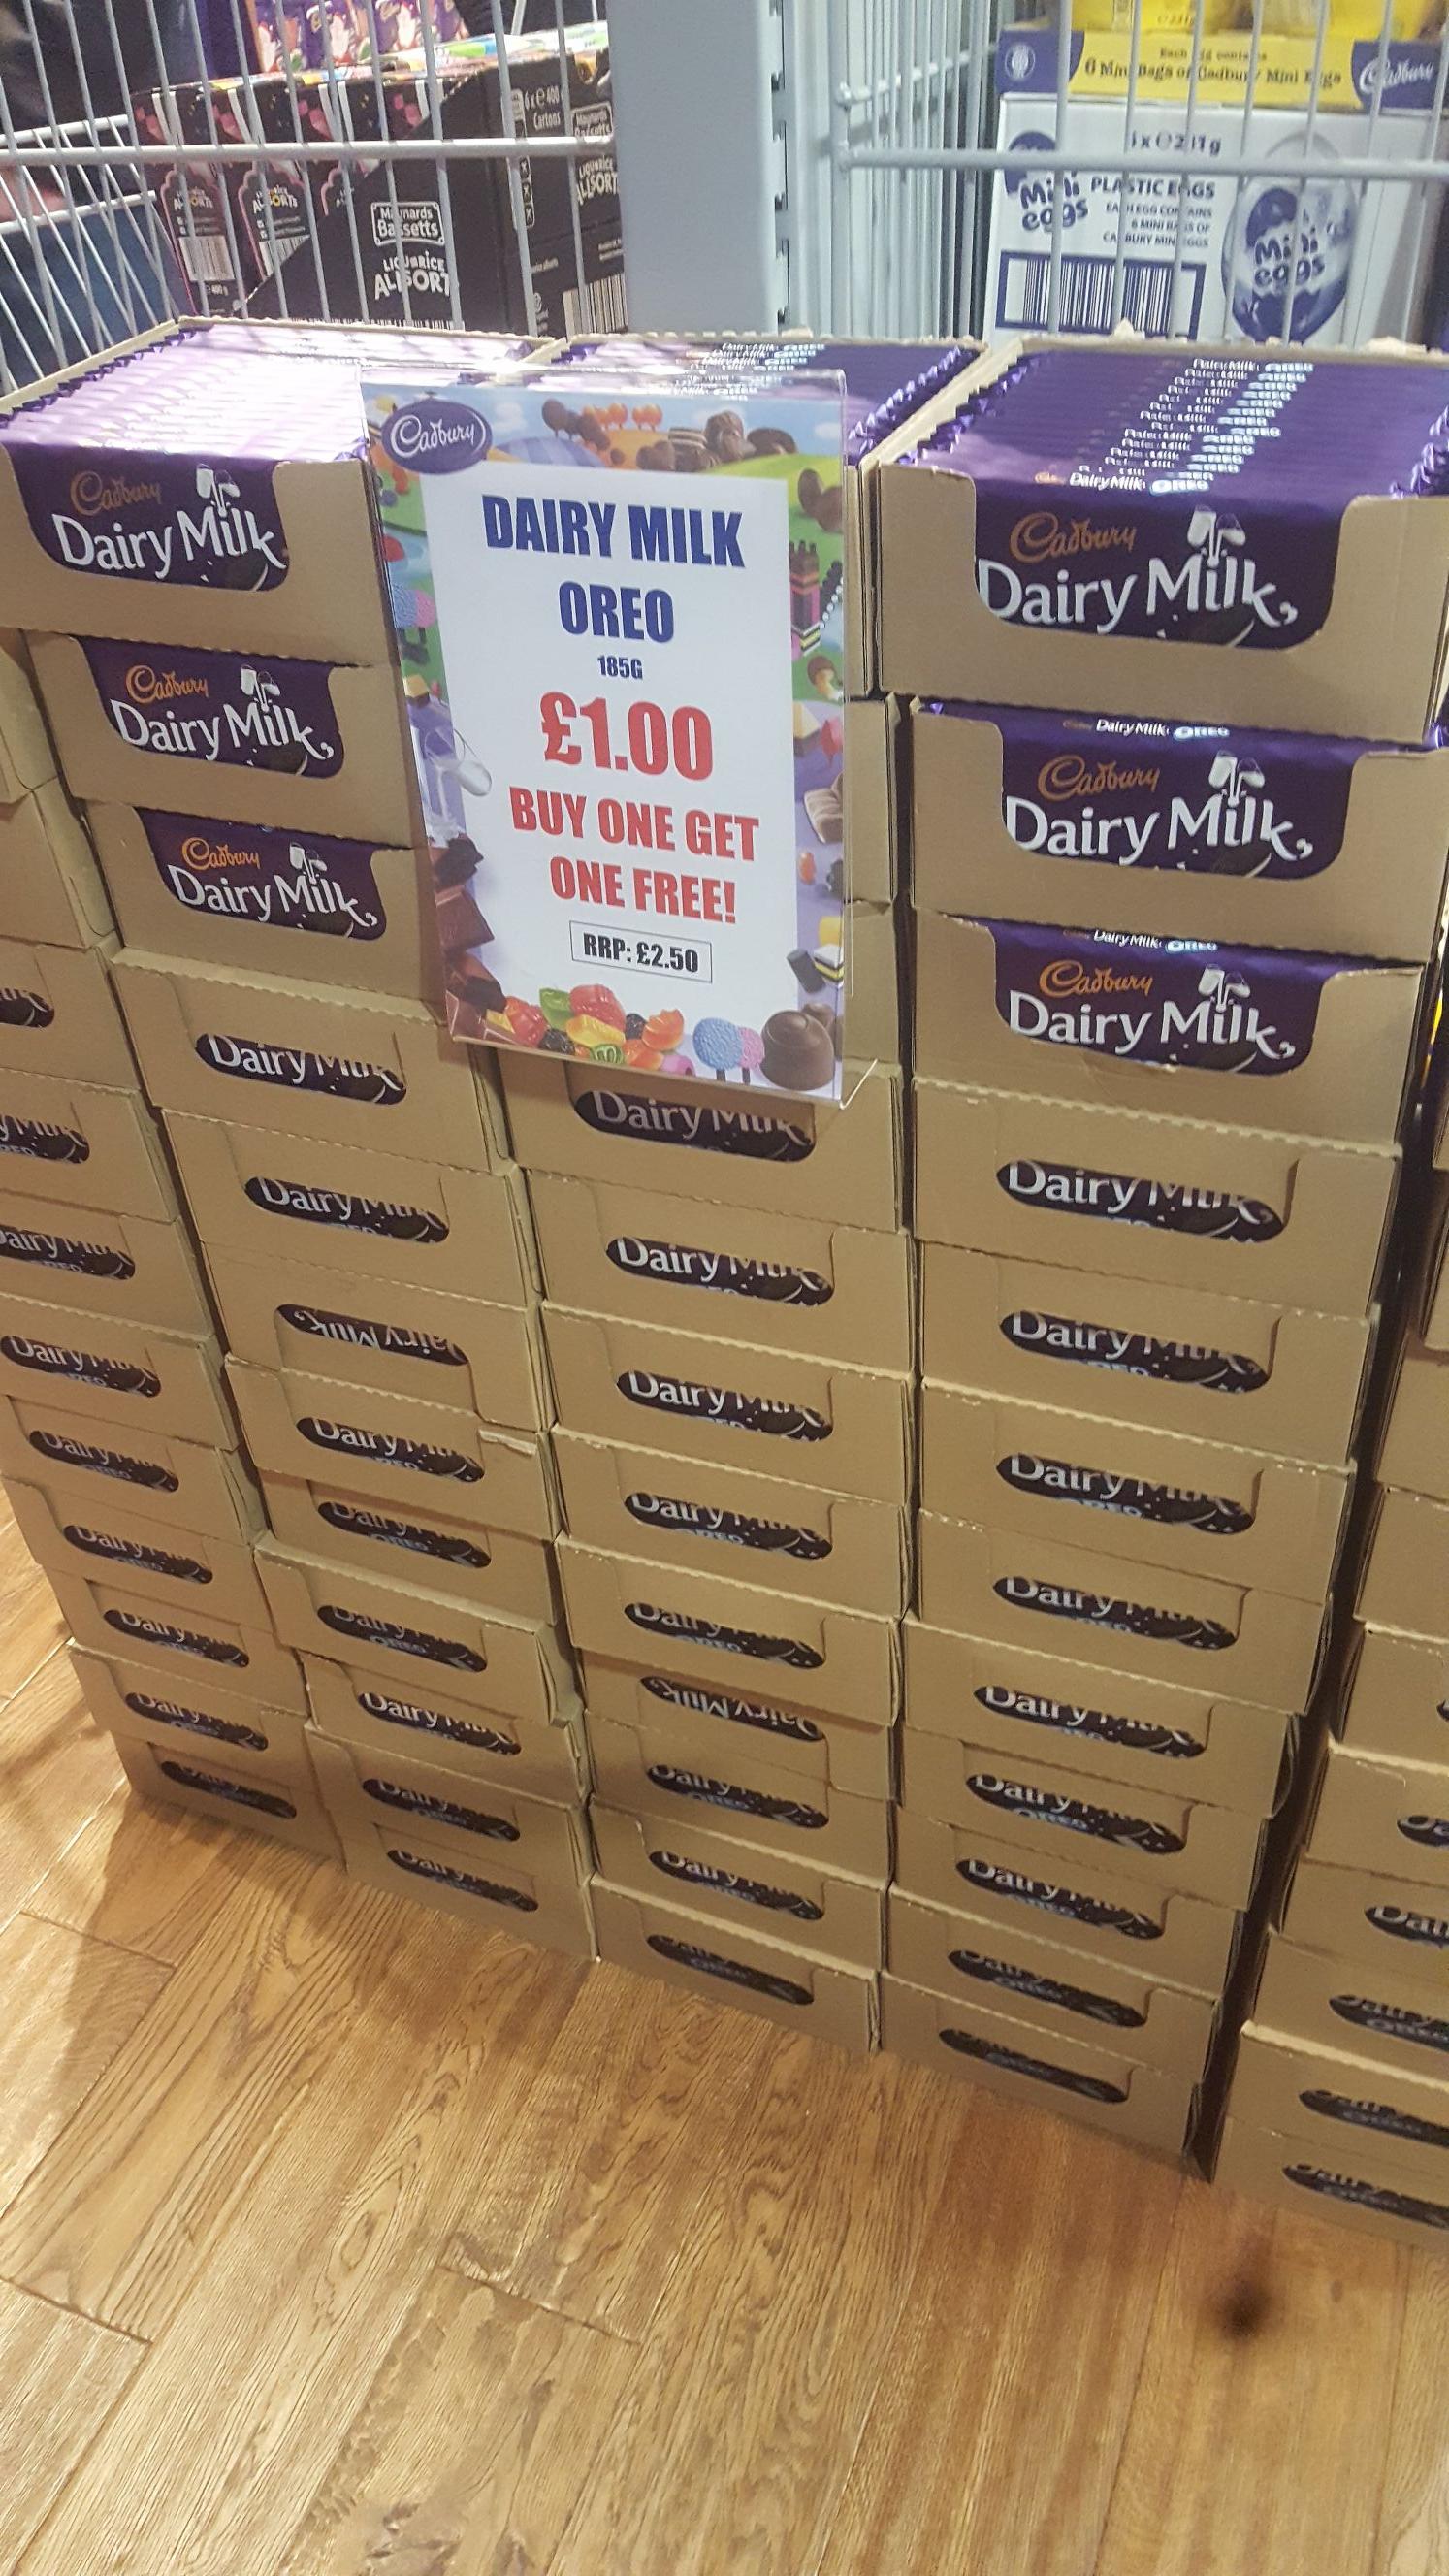 Cadbury Oreo 185g Bar Buy One Get One Free - £1 instore @ Cadbury's